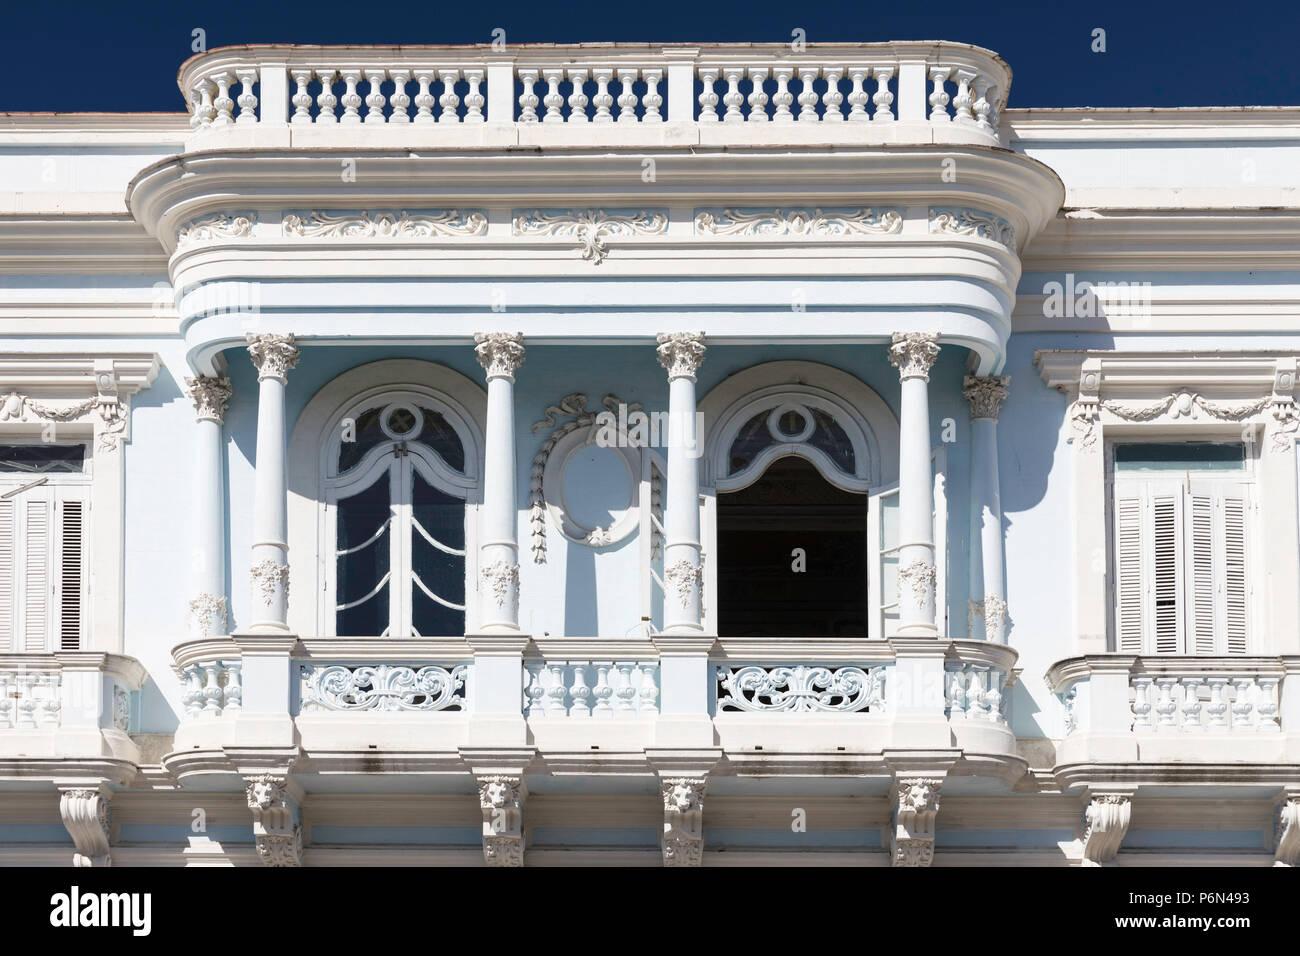 La Casa de Cultura nel Palacio Ferrer edificio dettaglio in Cienfuegos, Cuba. Immagini Stock